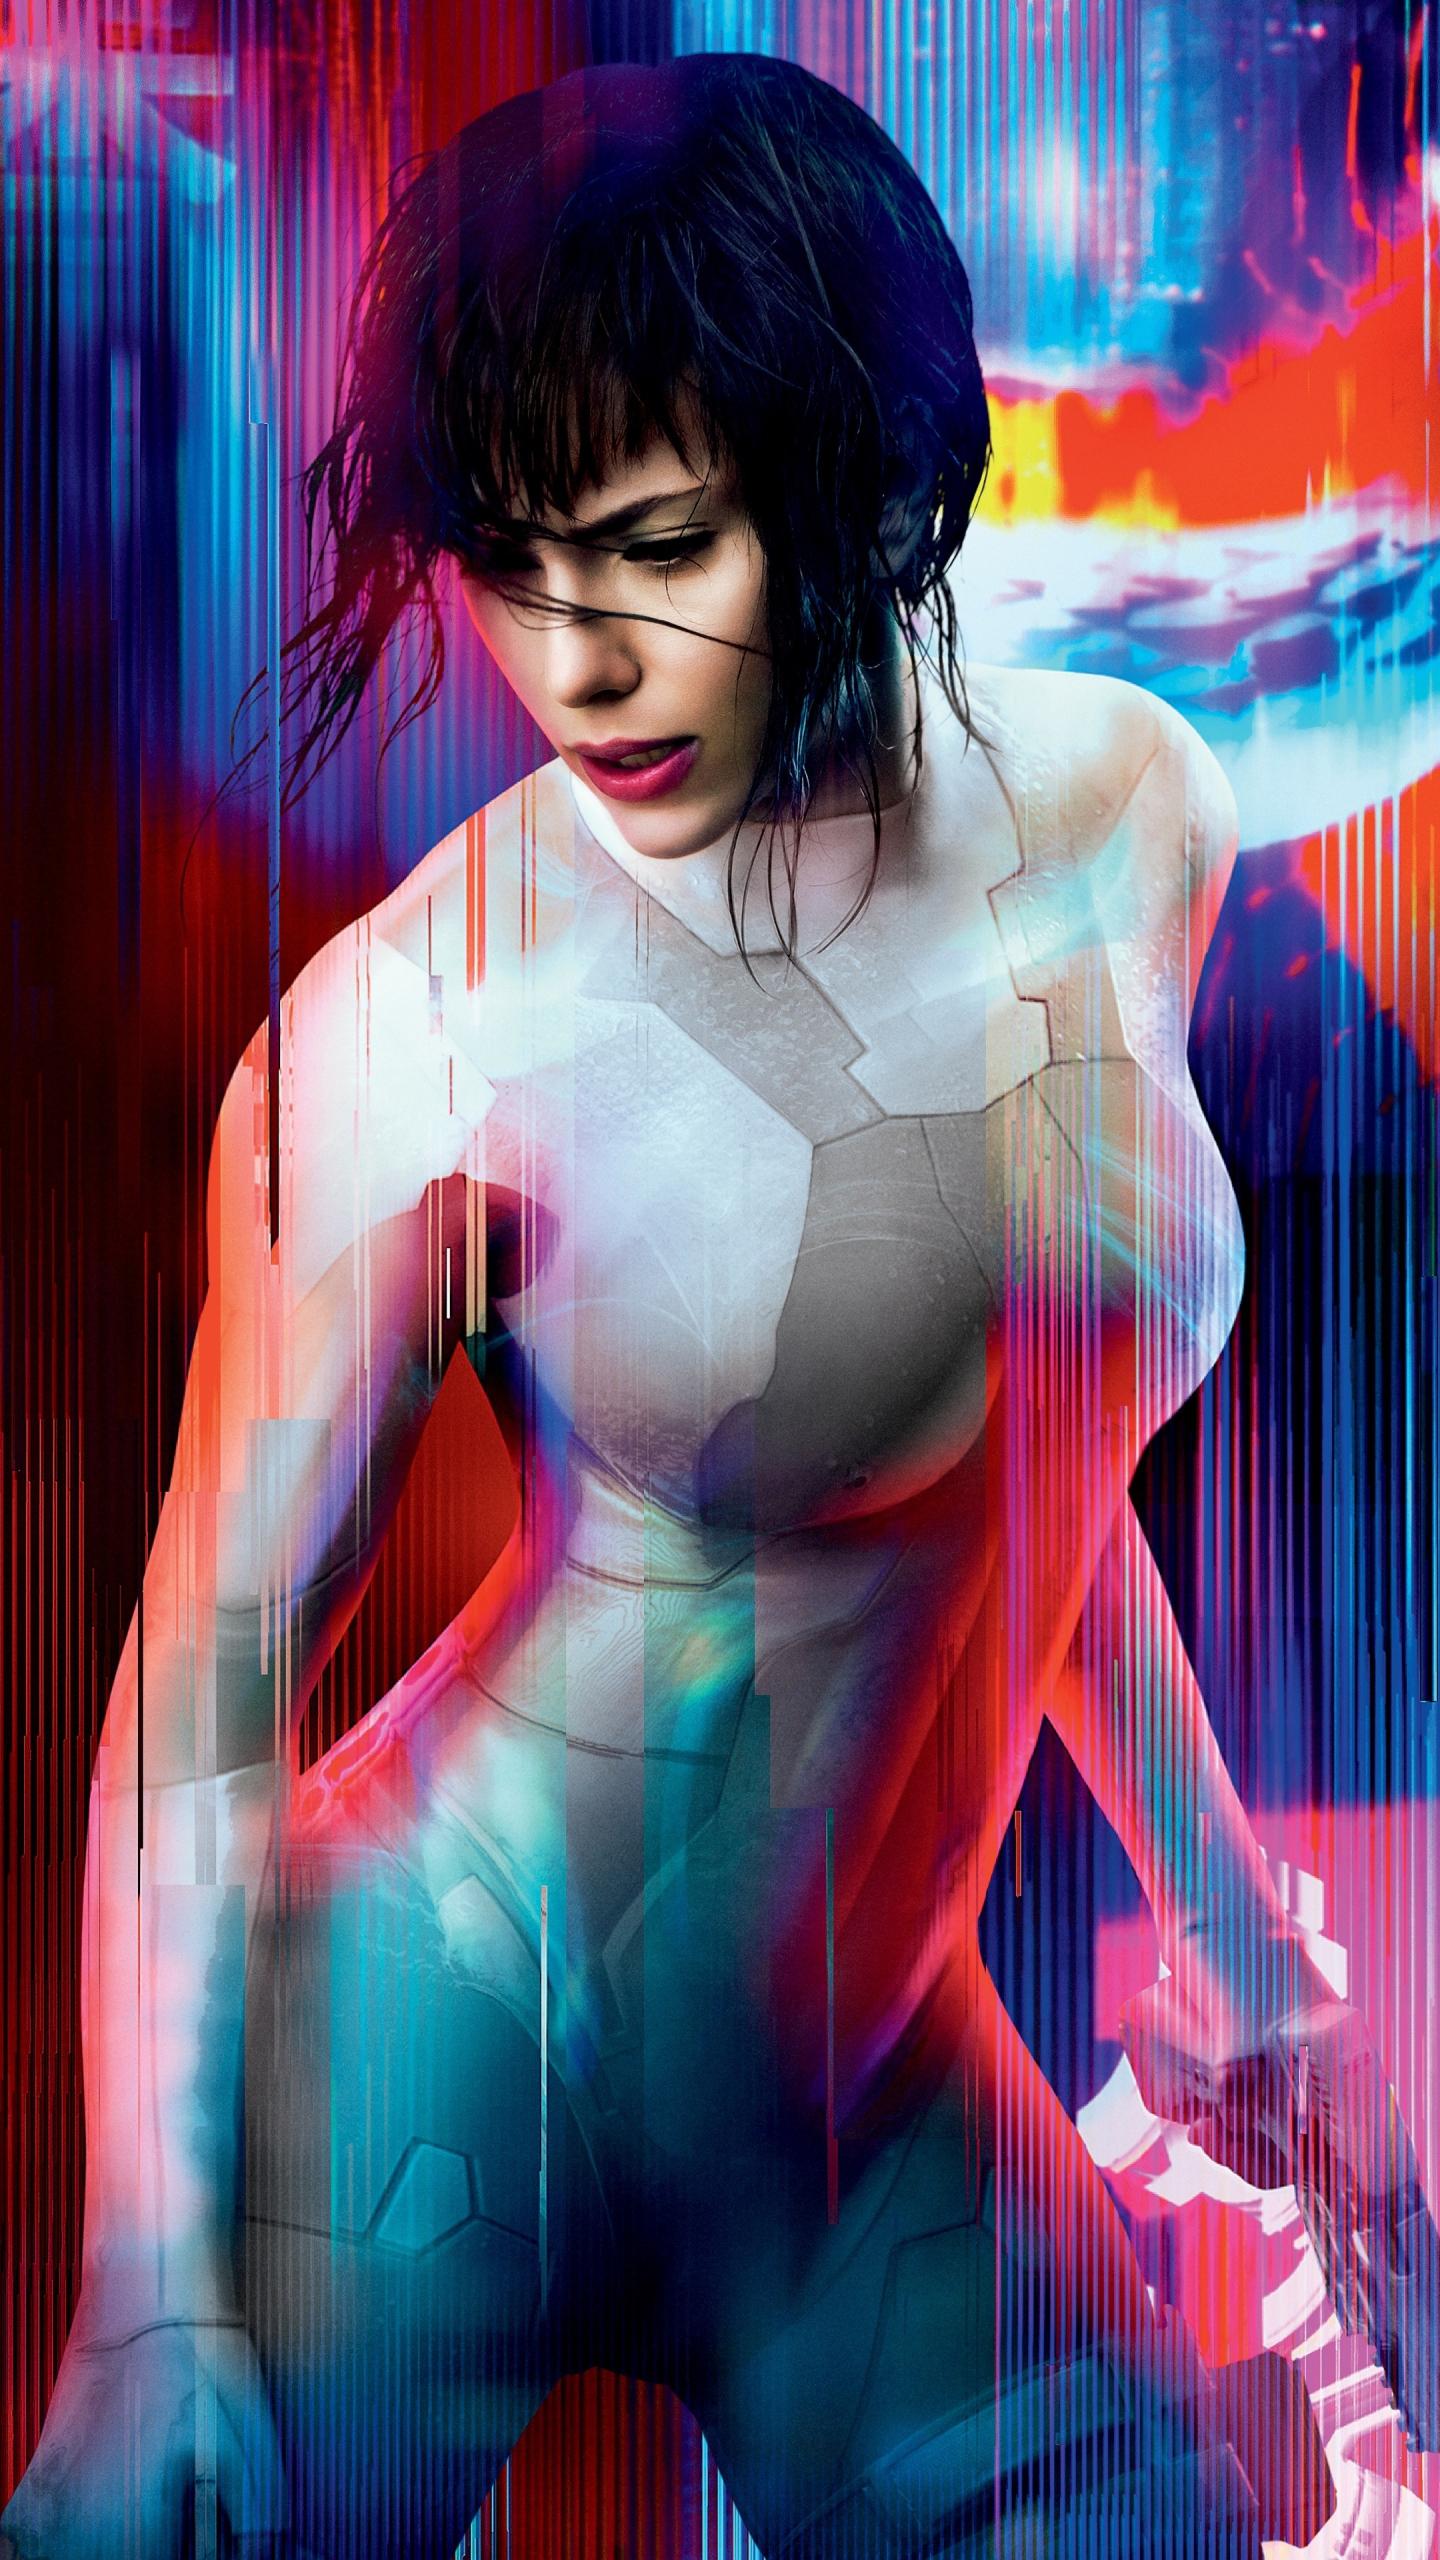 Download 1440x2560 Wallpaper Ghost In The Shell Scarlett